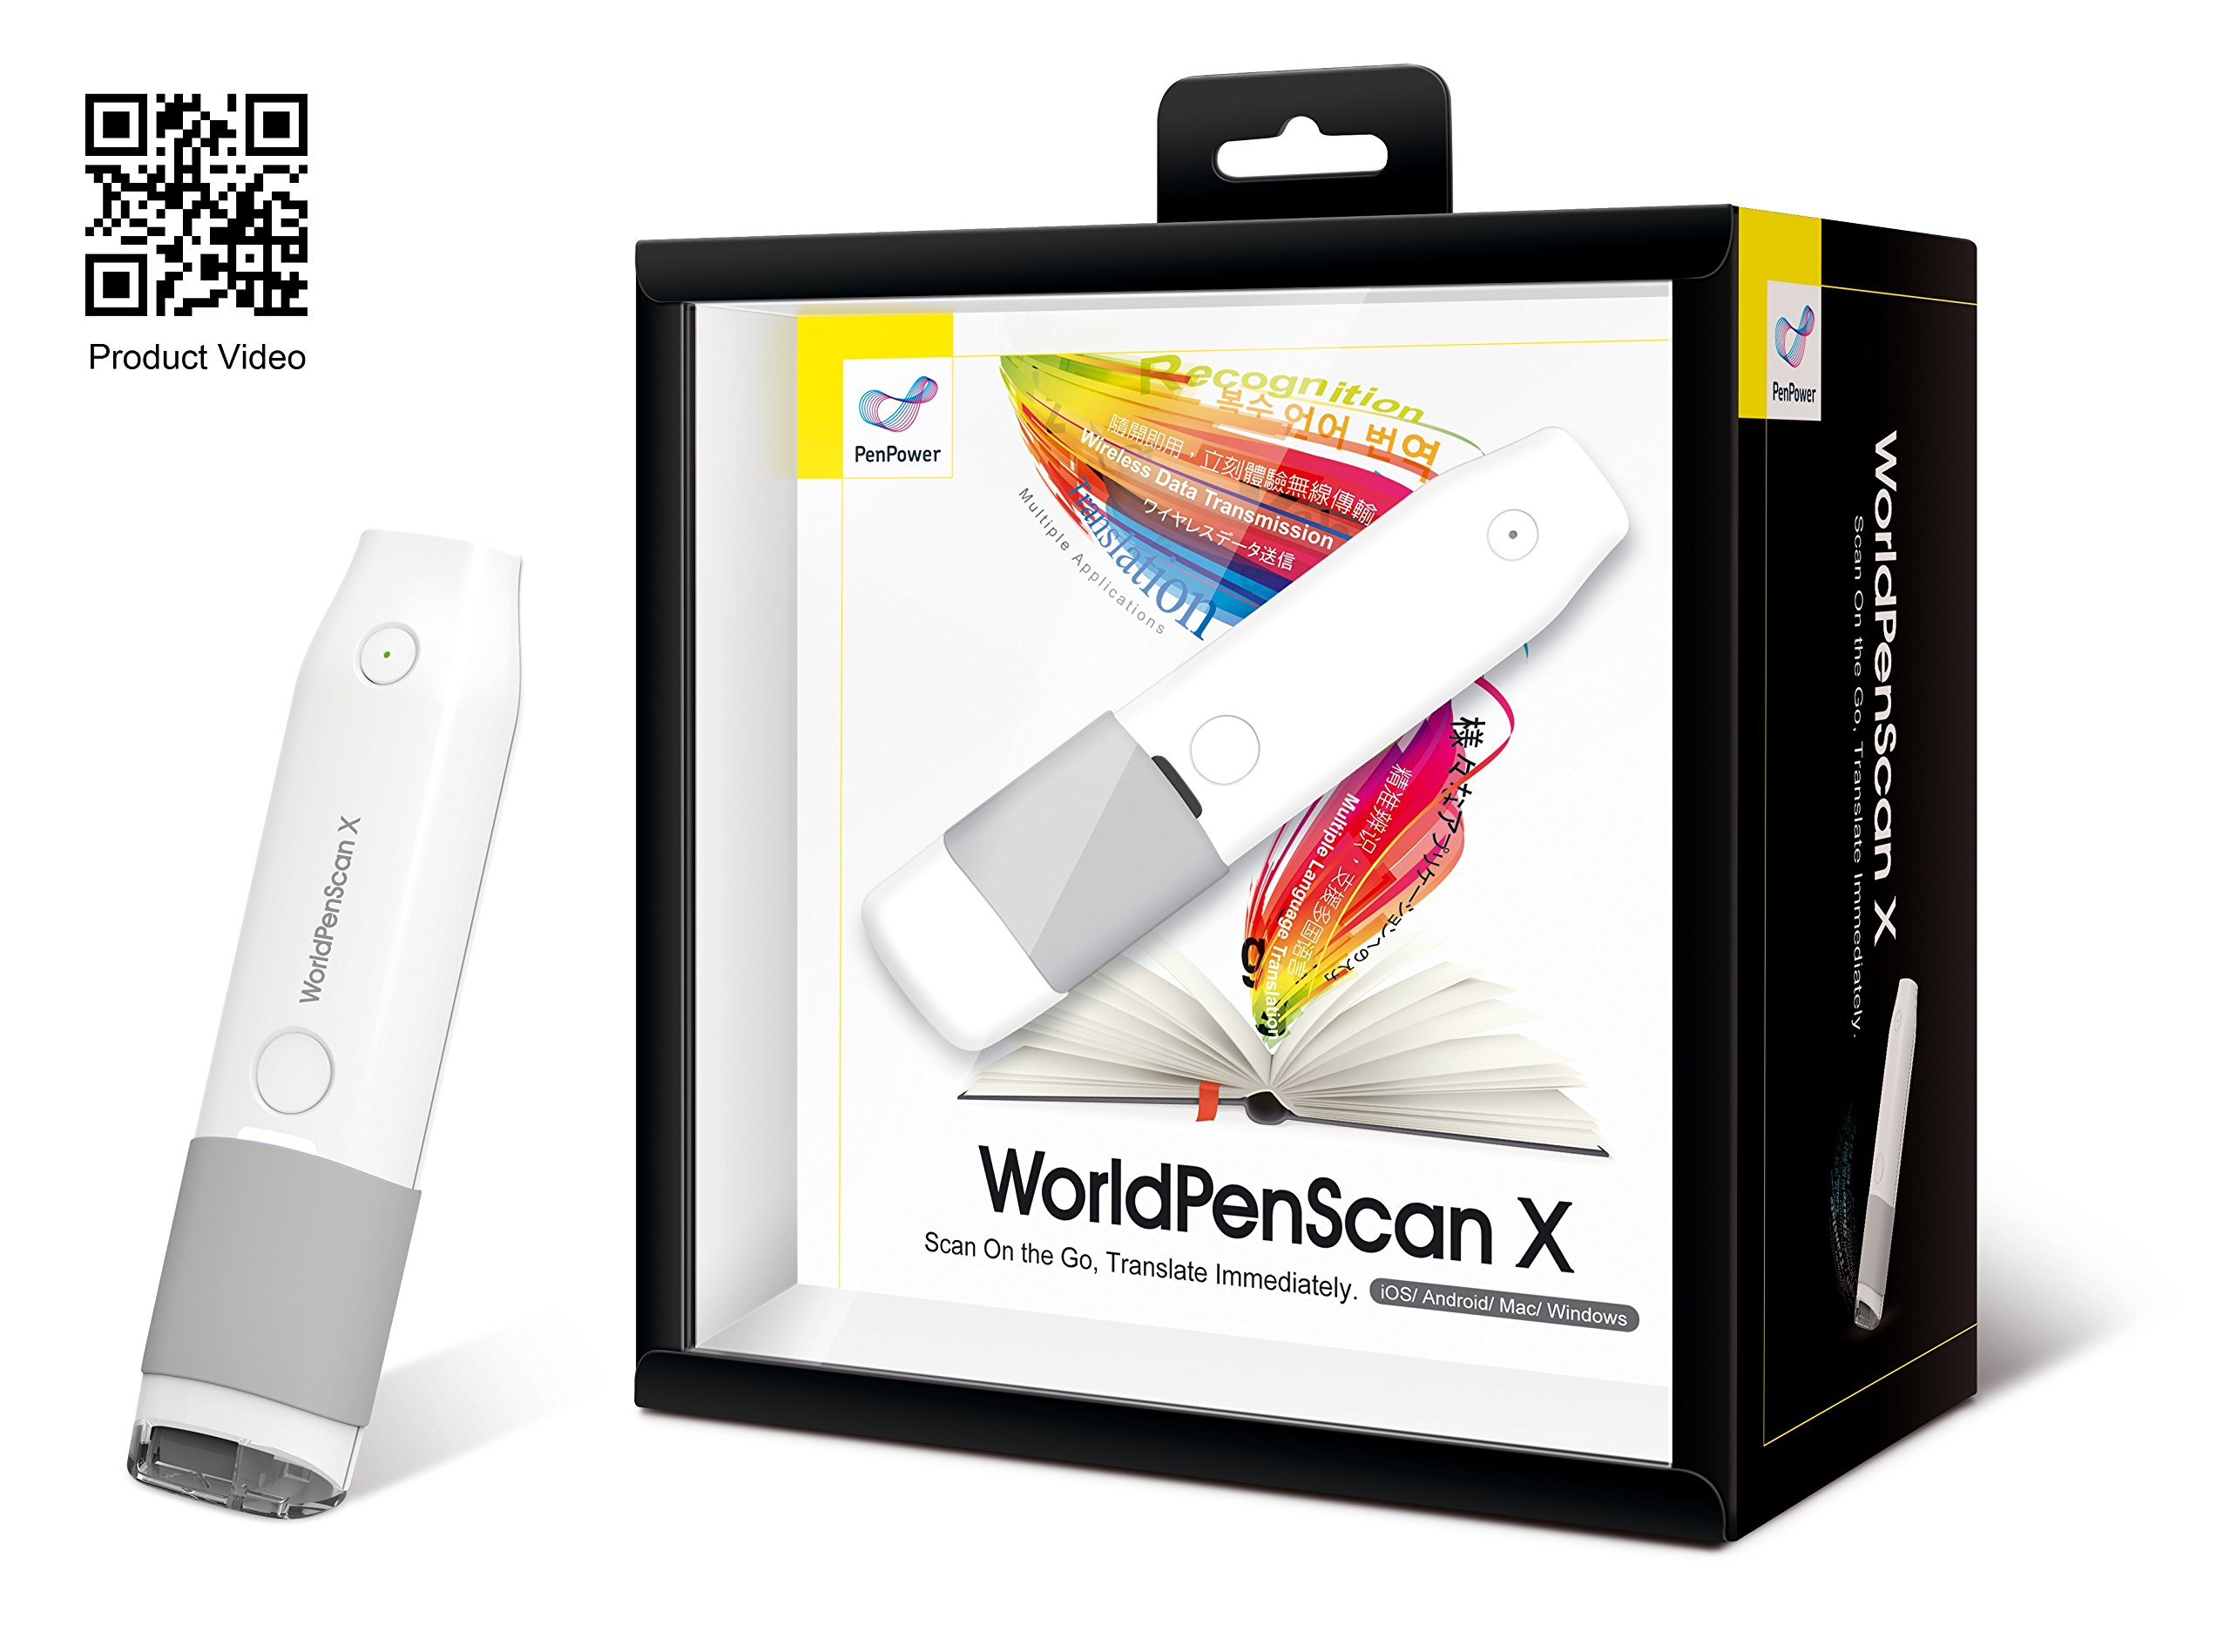 PenPower WorldPenScan X (iOS/Android/Mac/Windows) by PenPower